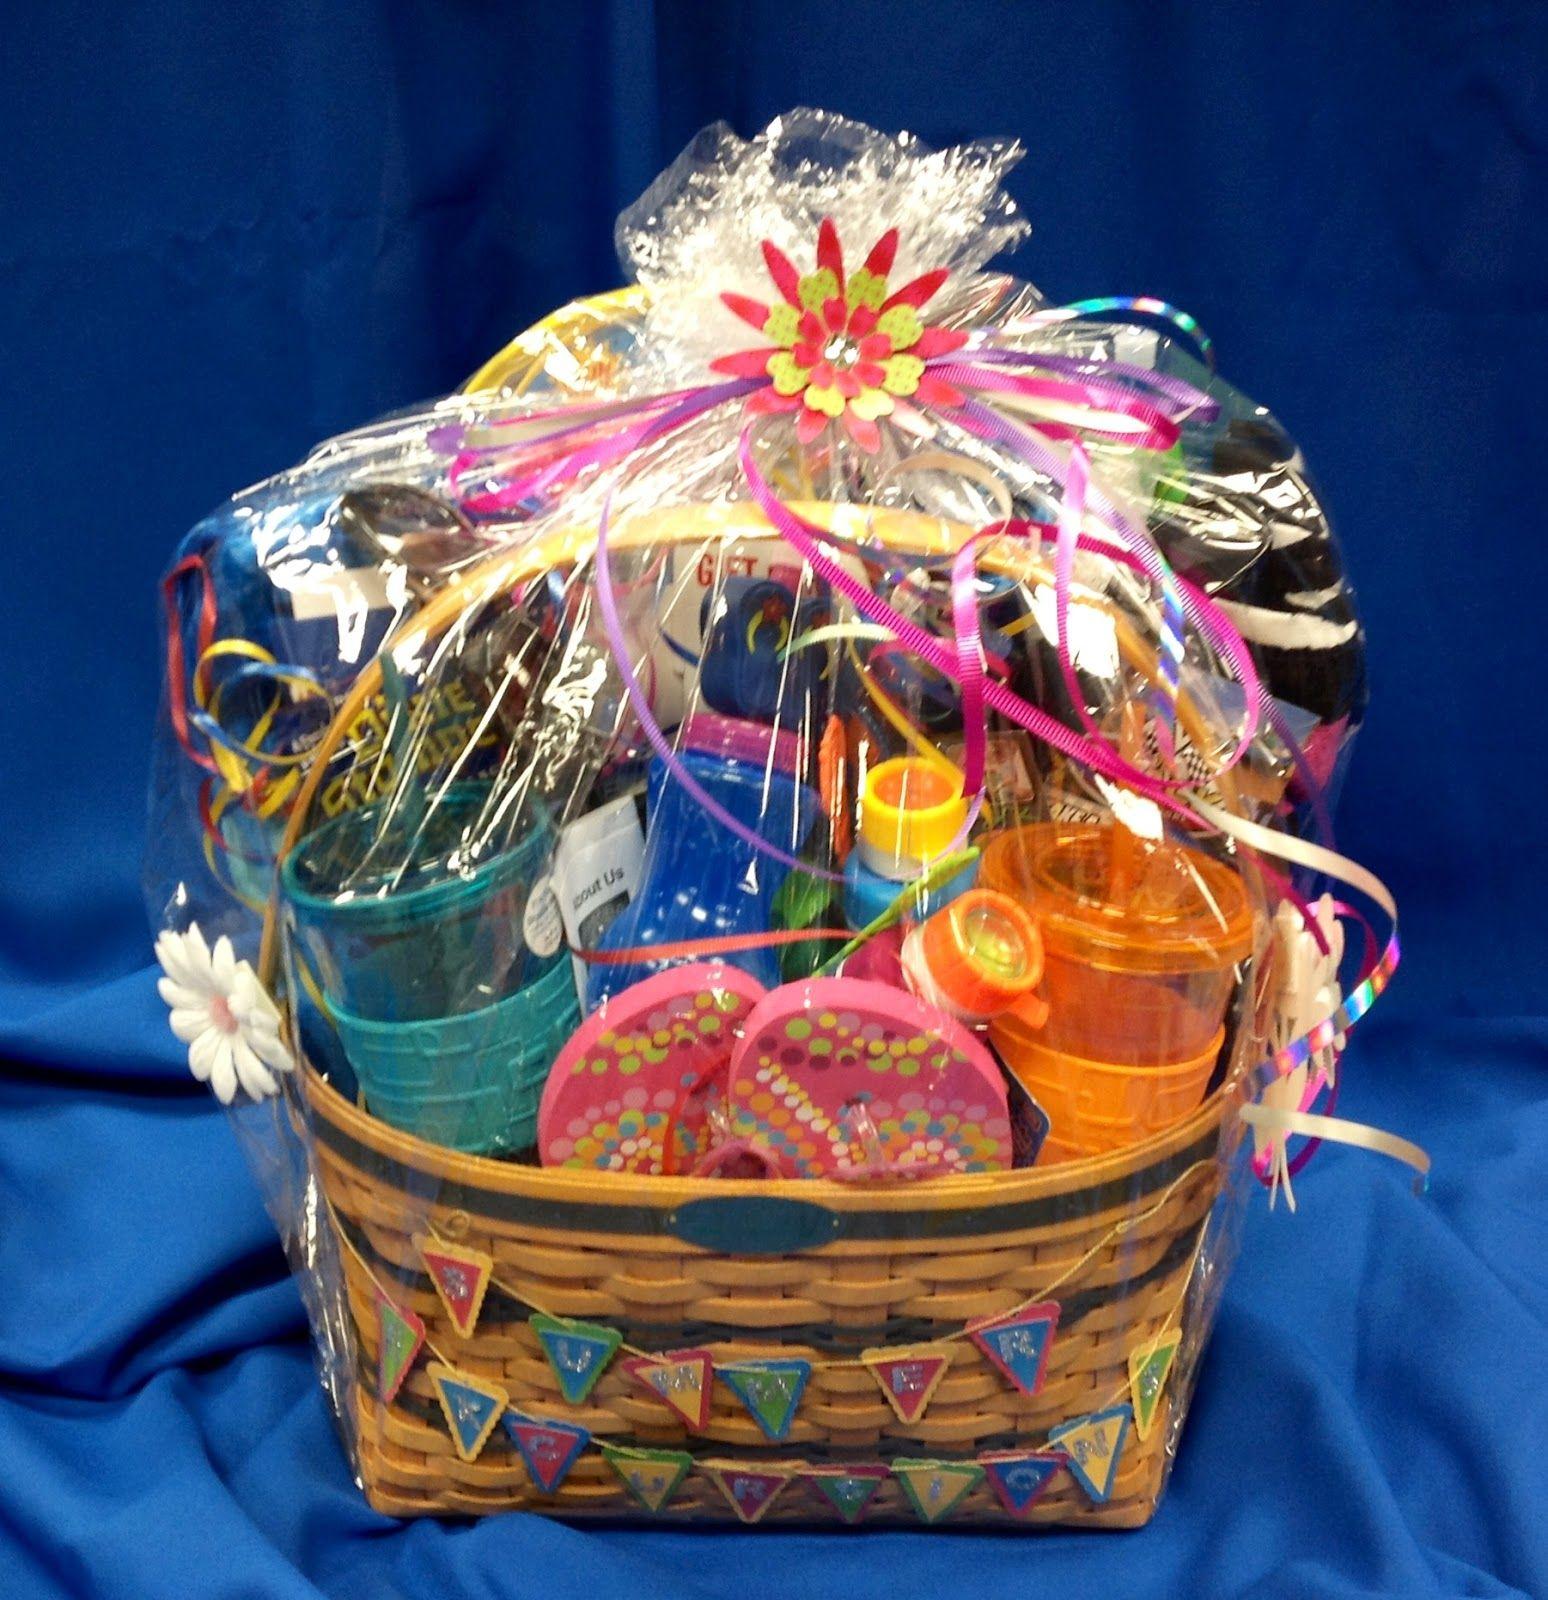 Summer Raffle Basket Ideas Names For Themed Raffle